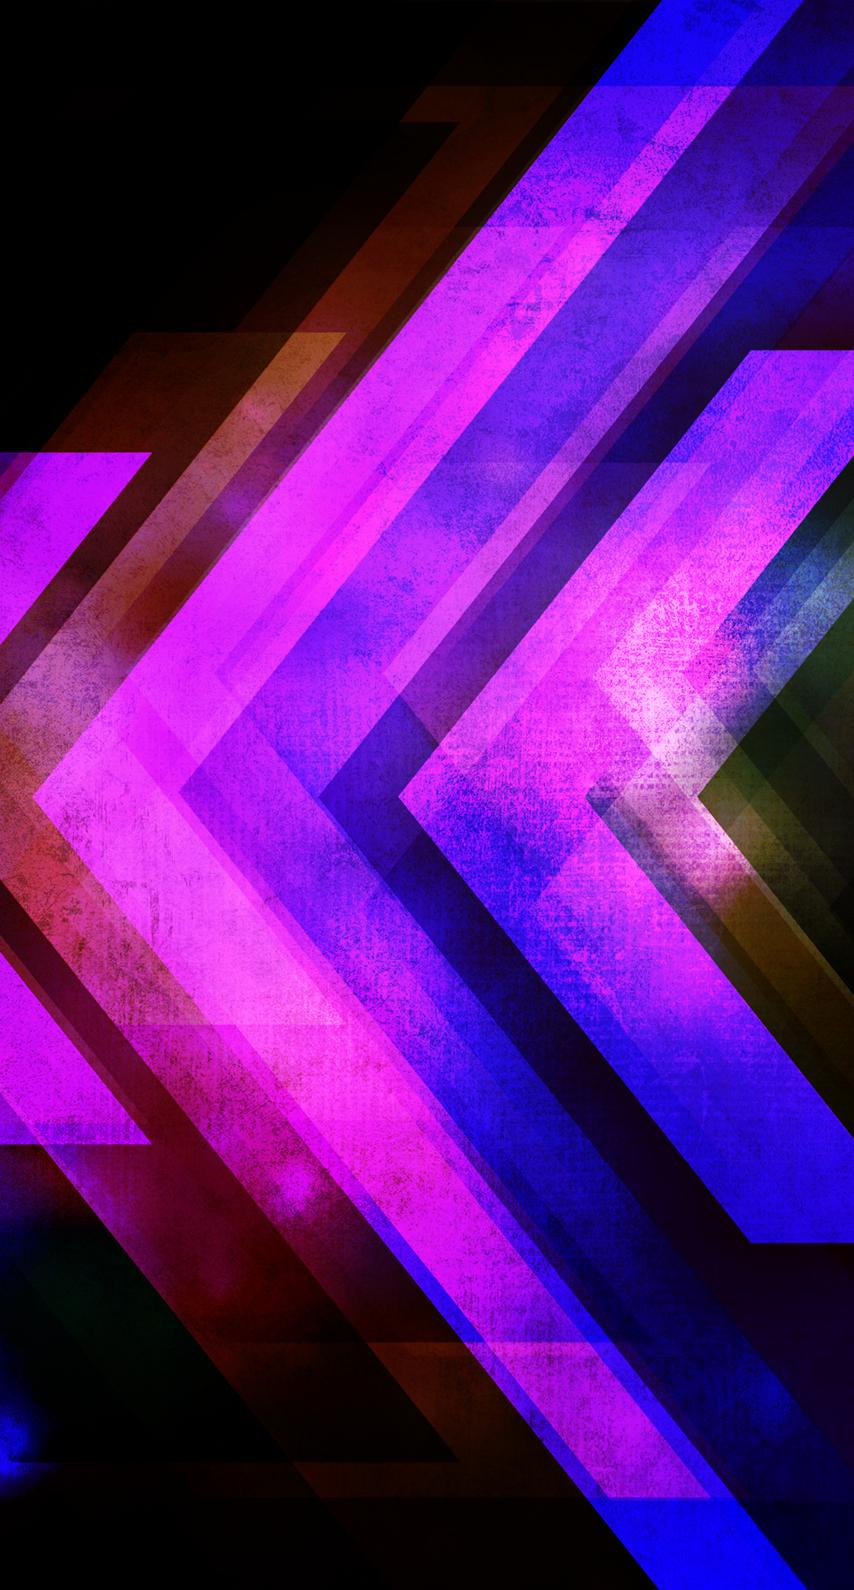 geometry, artistic, art, graphic, design, background, insubstantial, wallpaper, desktop, illustration